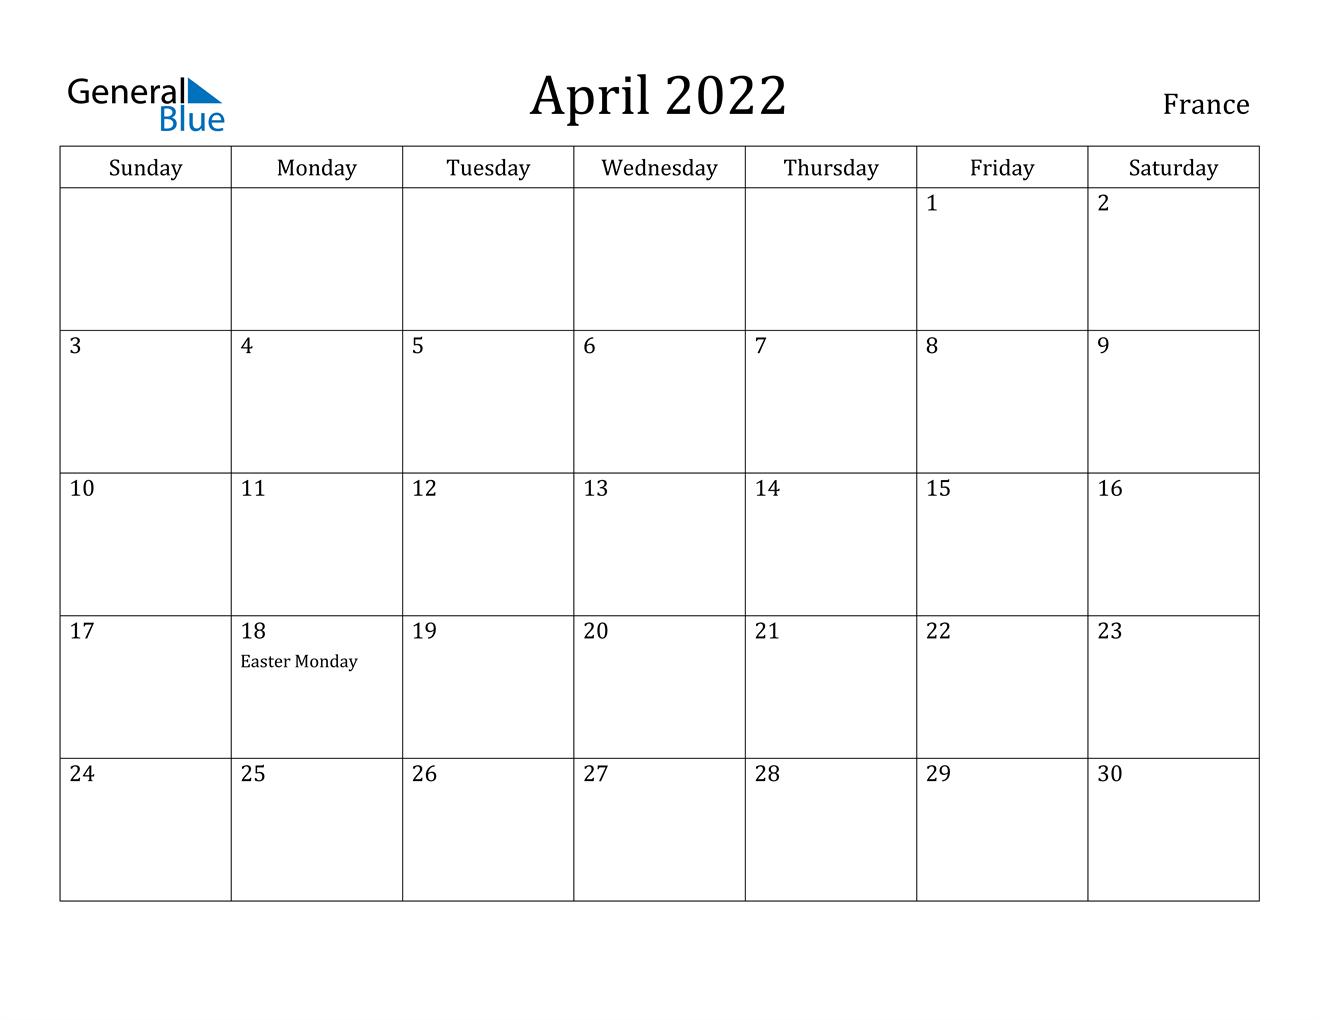 Calendar 2022 April.France April 2022 Calendar With Holidays